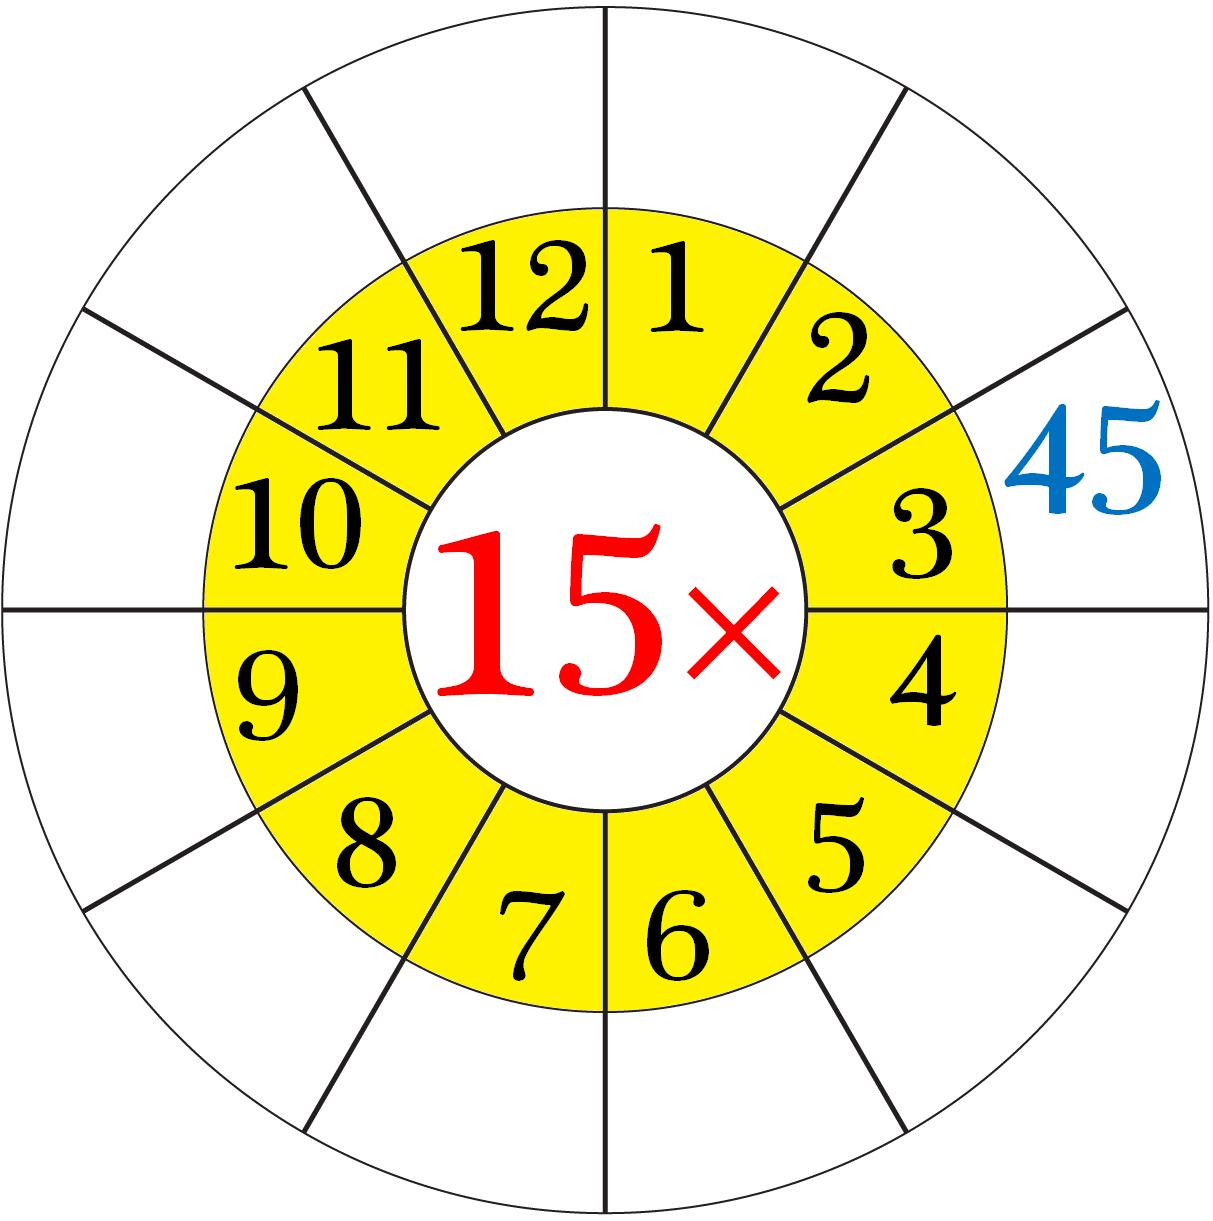 Worksheet On Multiplication Table Of 15 | Word Problems On with Printable Multiplication Table 1-15